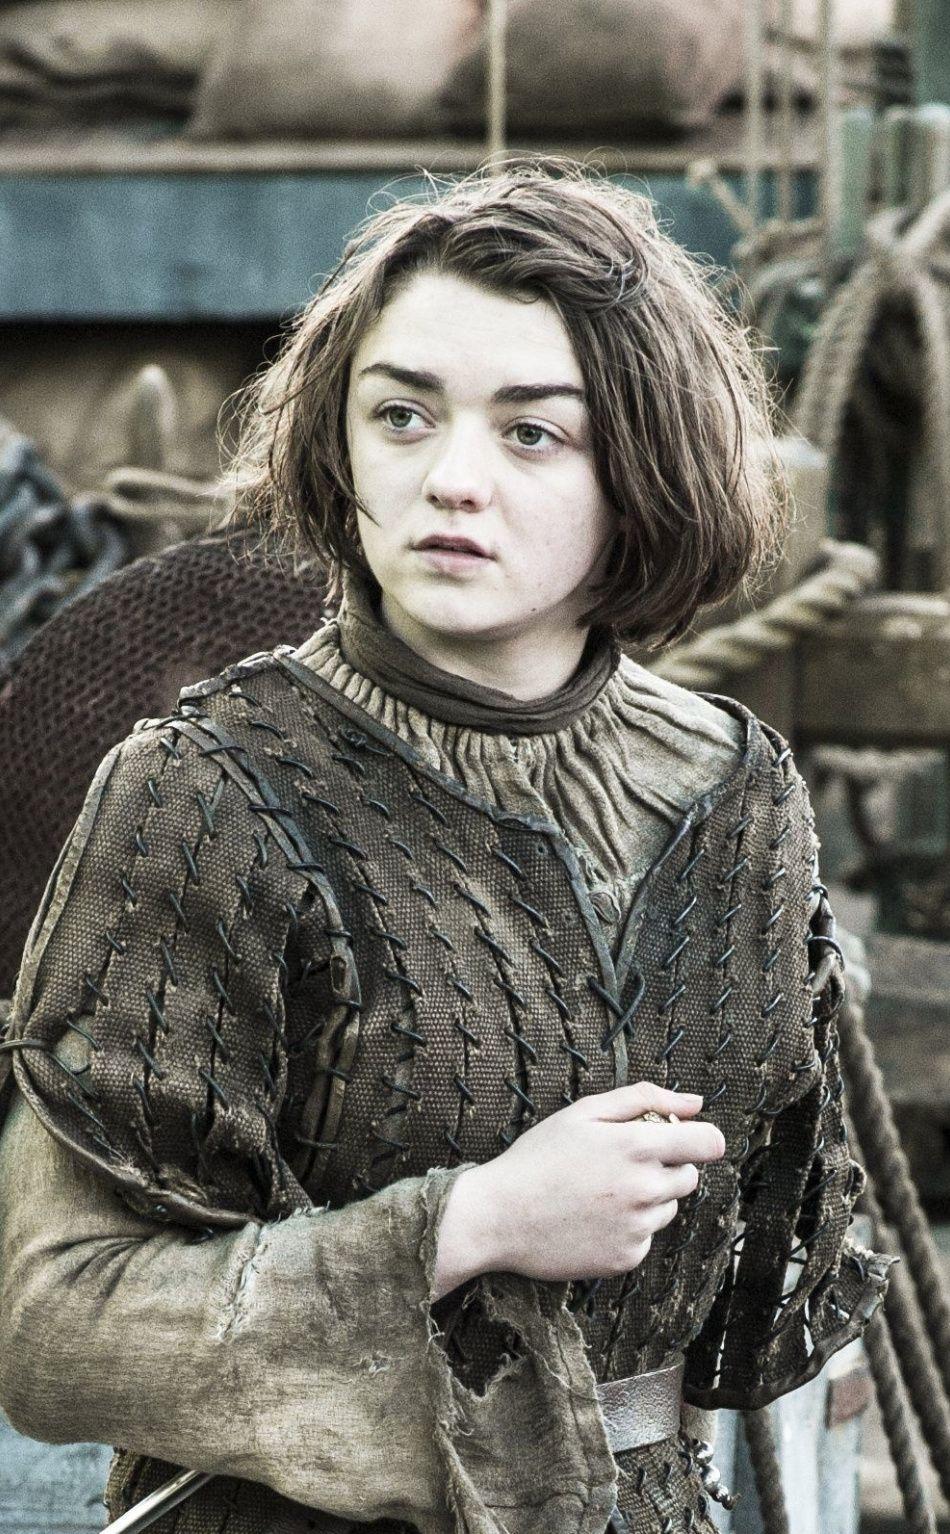 Arya Stark Maisie Williams Game Of Thrones Tv Show 950x1534 Wallpaper Arya Stark Arya Stark Wallpaper Maisie Williams